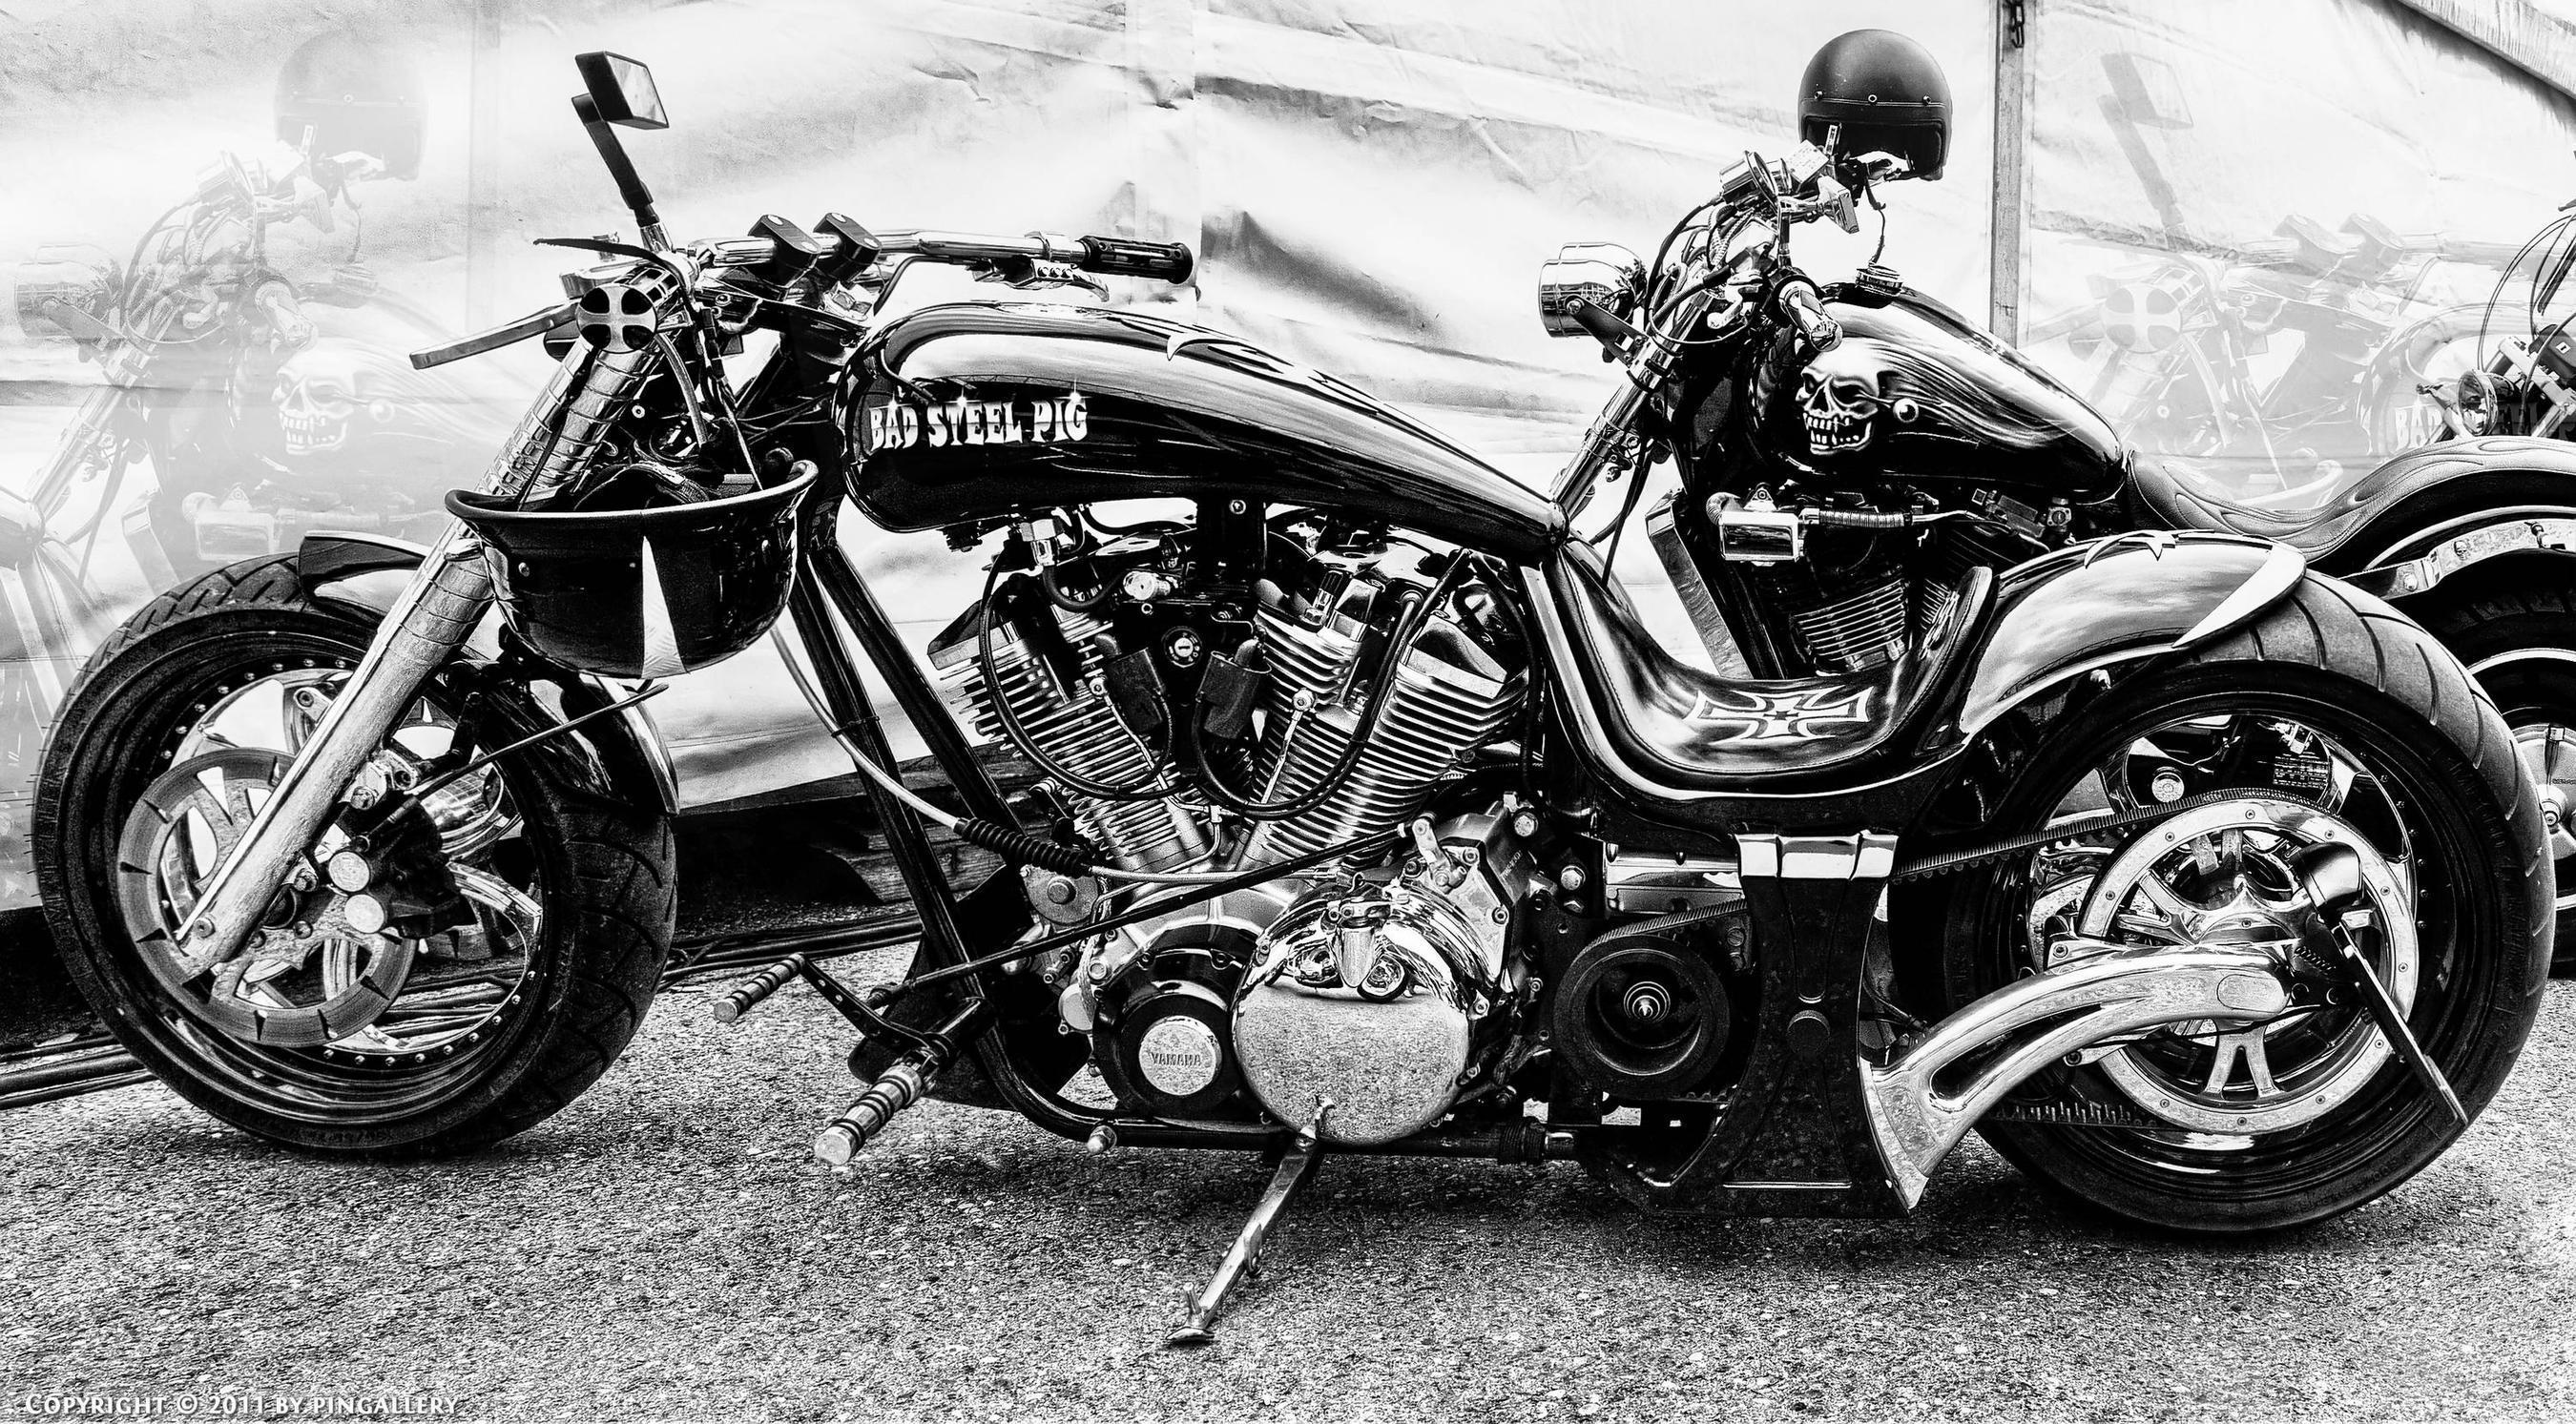 Harley Davidson Wallpapers Wallpaper Cave